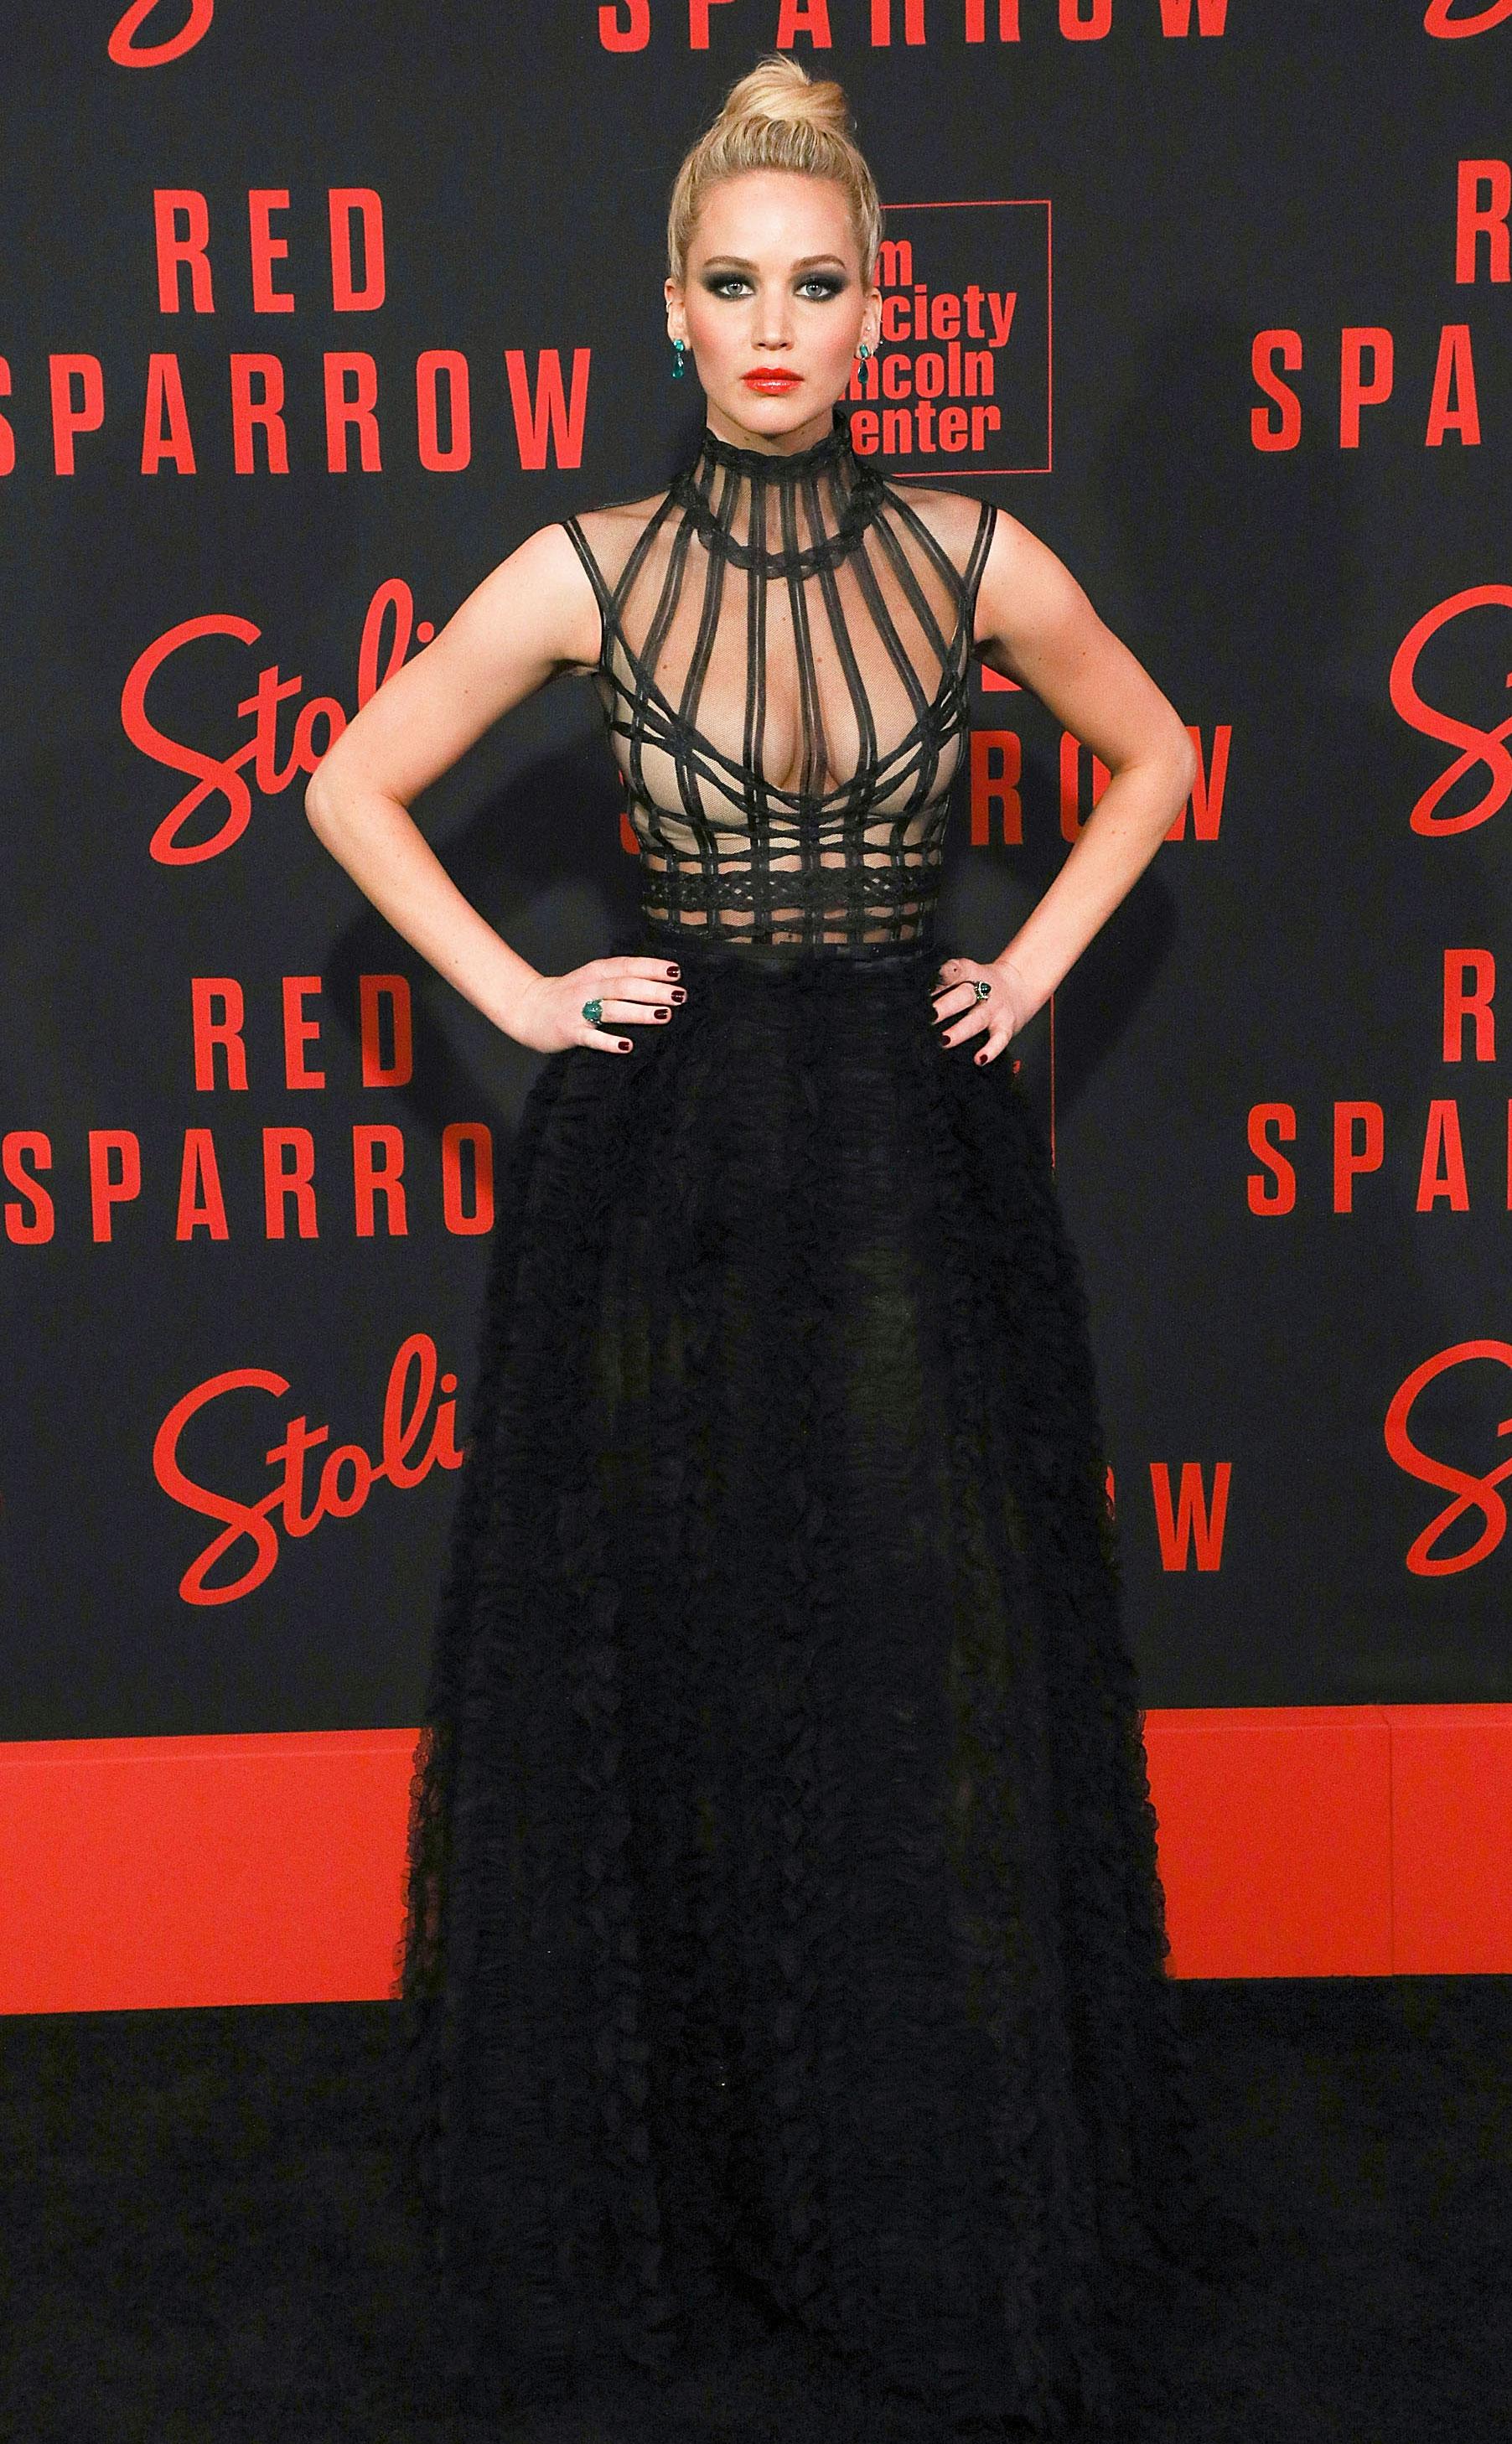 Watch Jennifer Lawrence Is on a Red-Carpet Hot Streak RightNow video